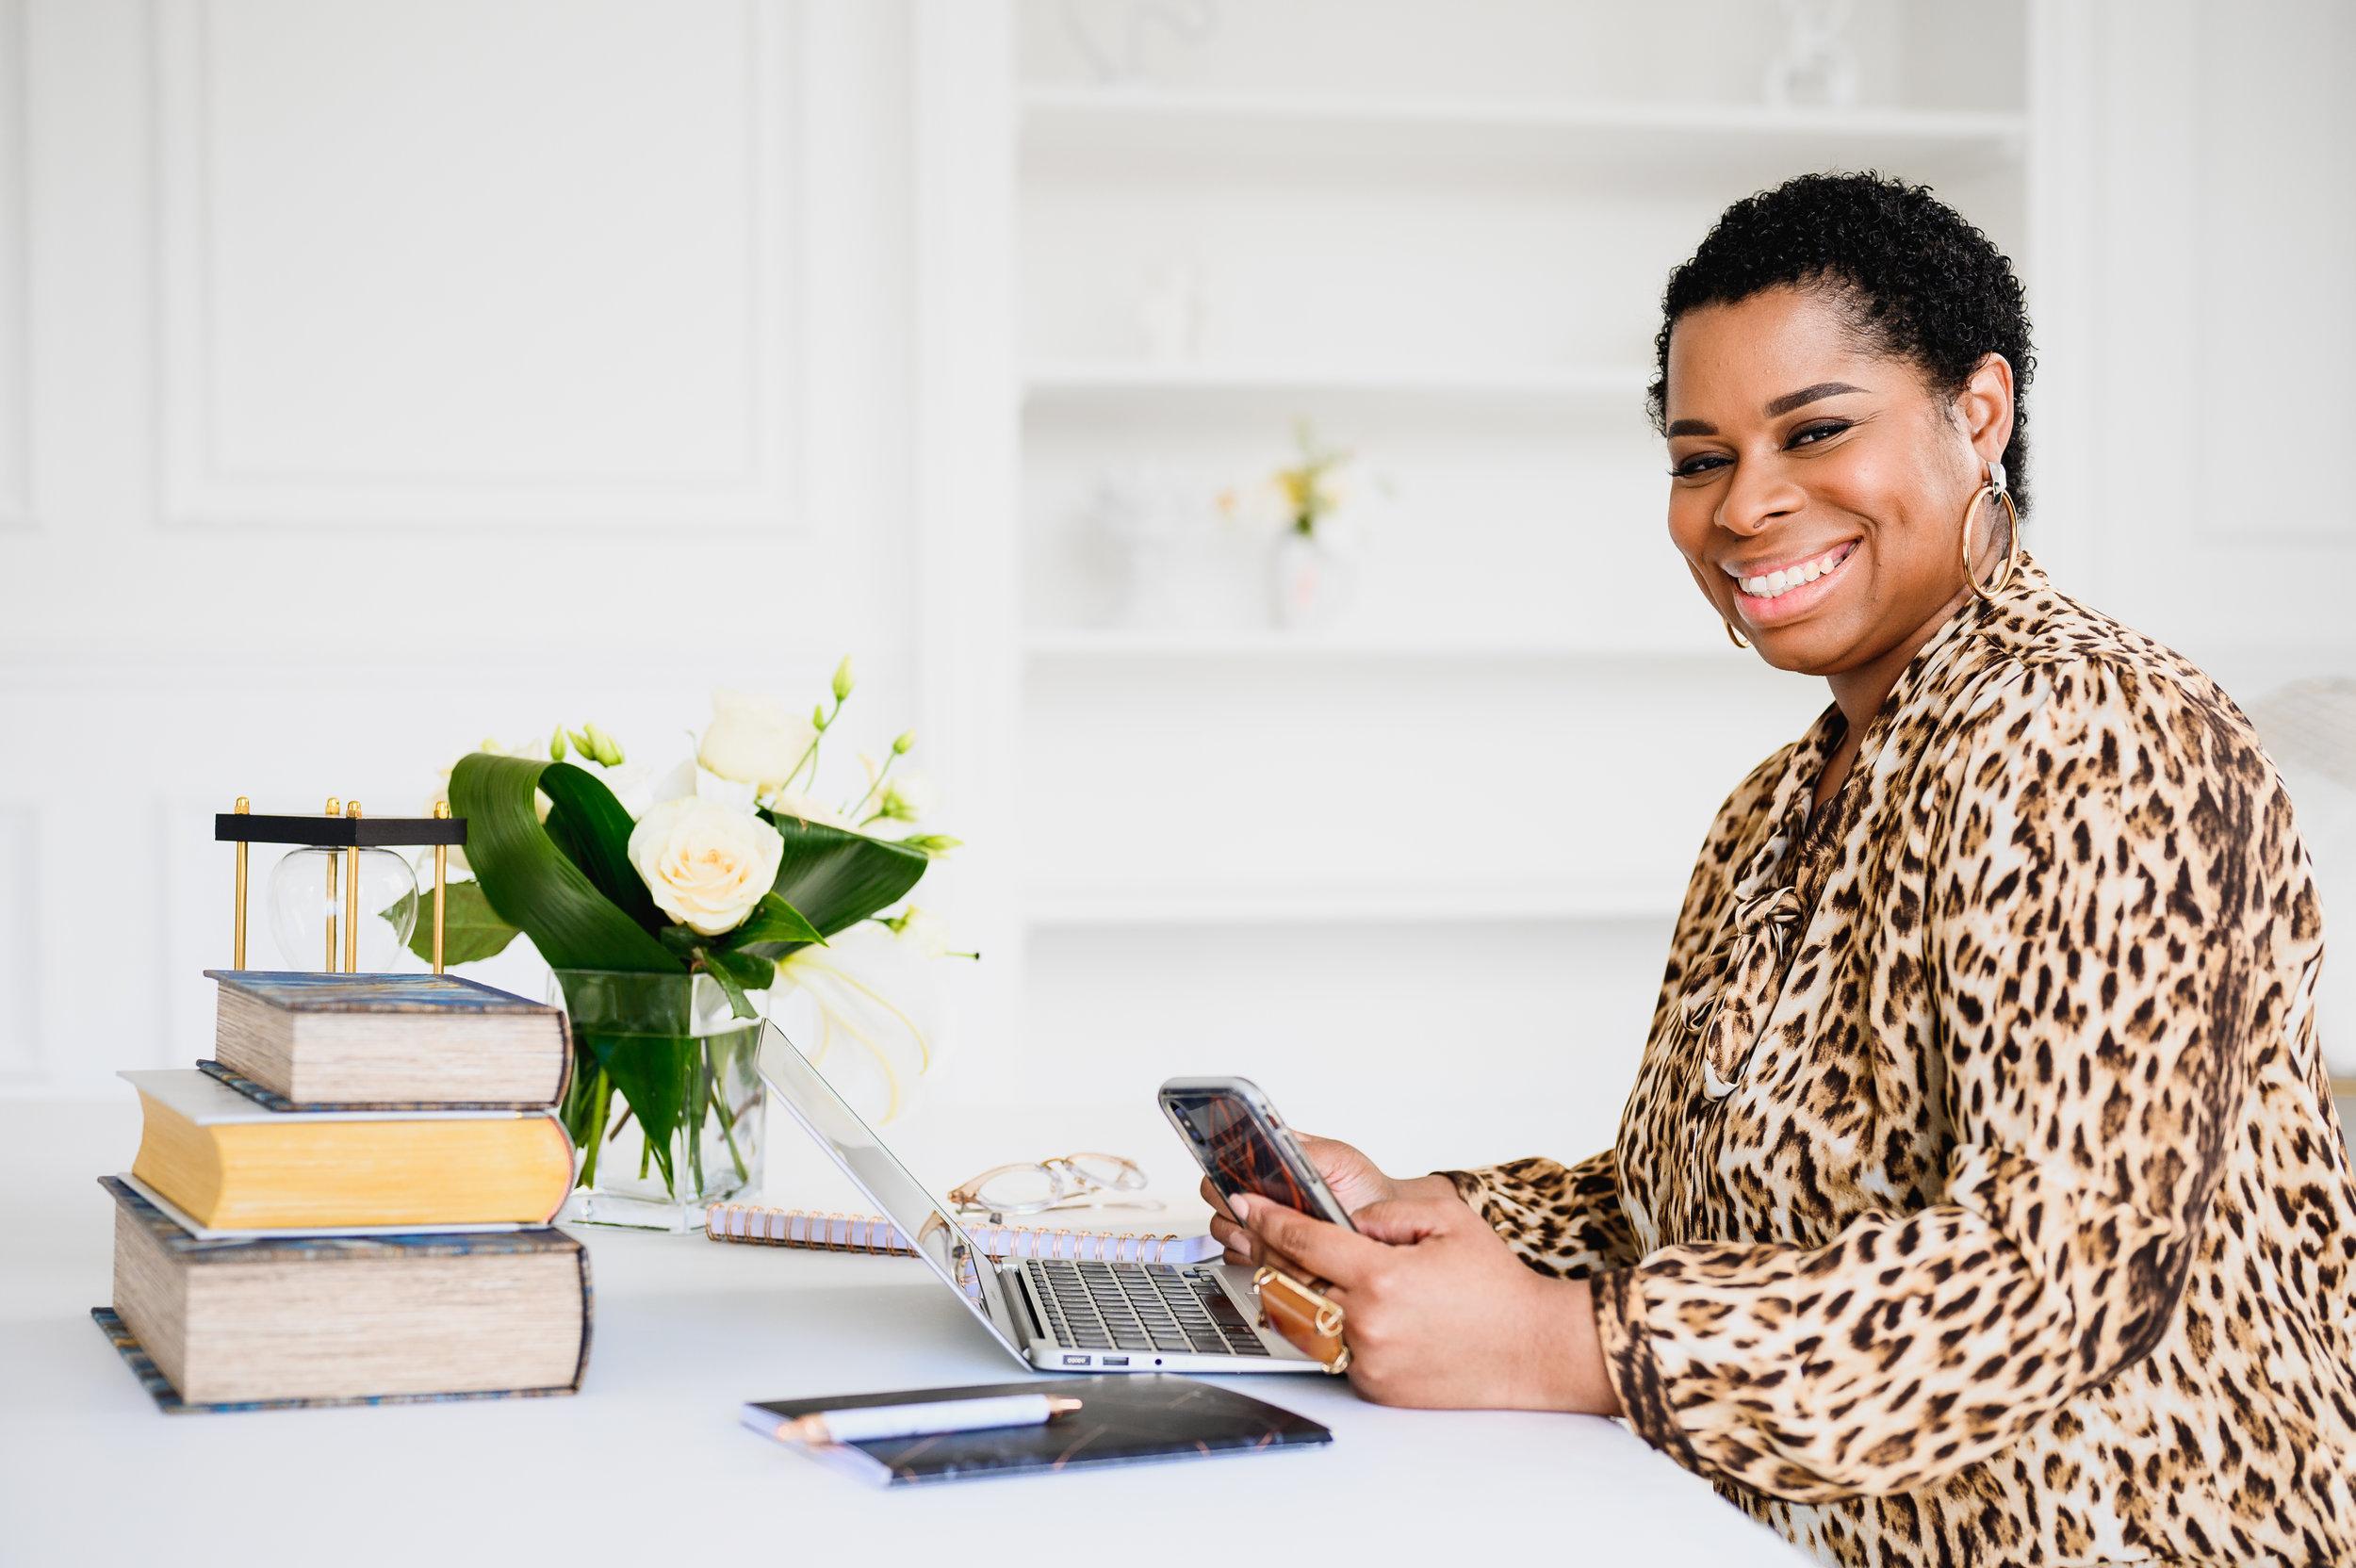 Andrea Henry Business LAW - PRINT - 2019 - Branding Photography - Mike Black PhotoWorks dot com-3.jpg